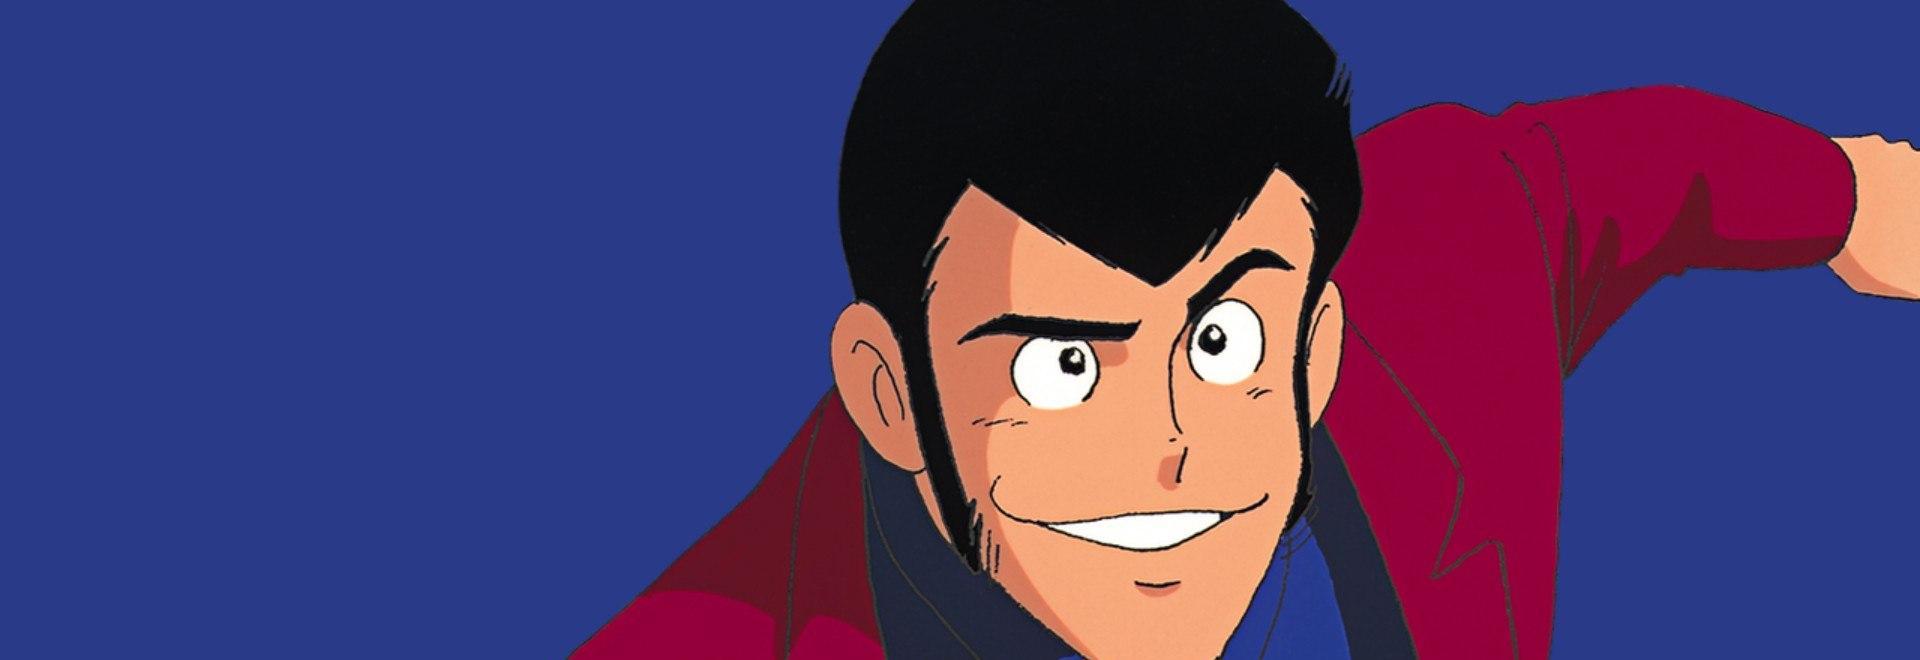 Lupin cowboy